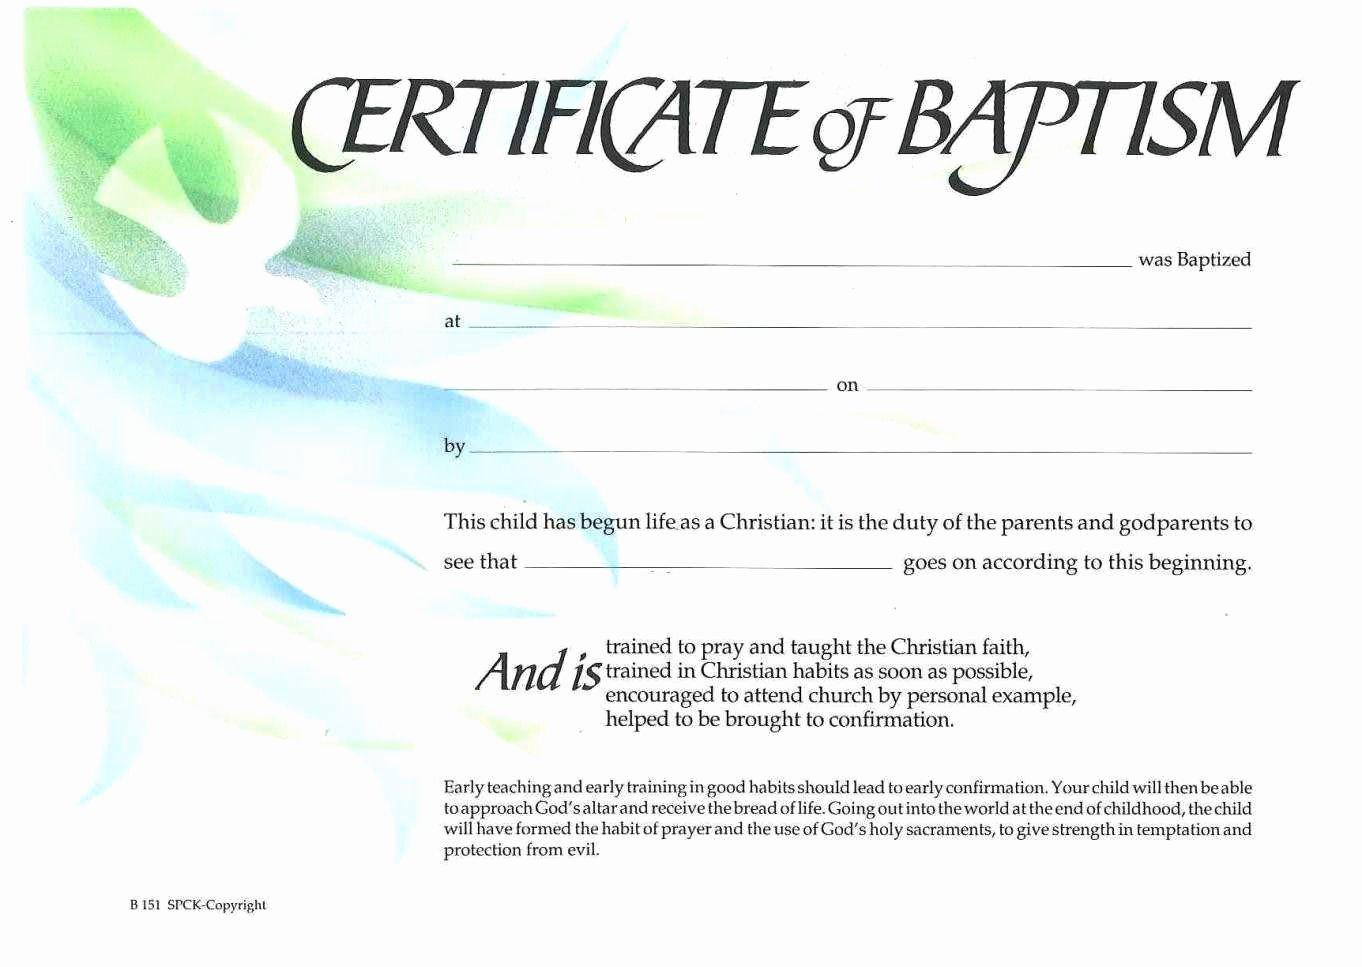 Baptism Certificate Template Word Elegant Sample Baptism Certificate Templates